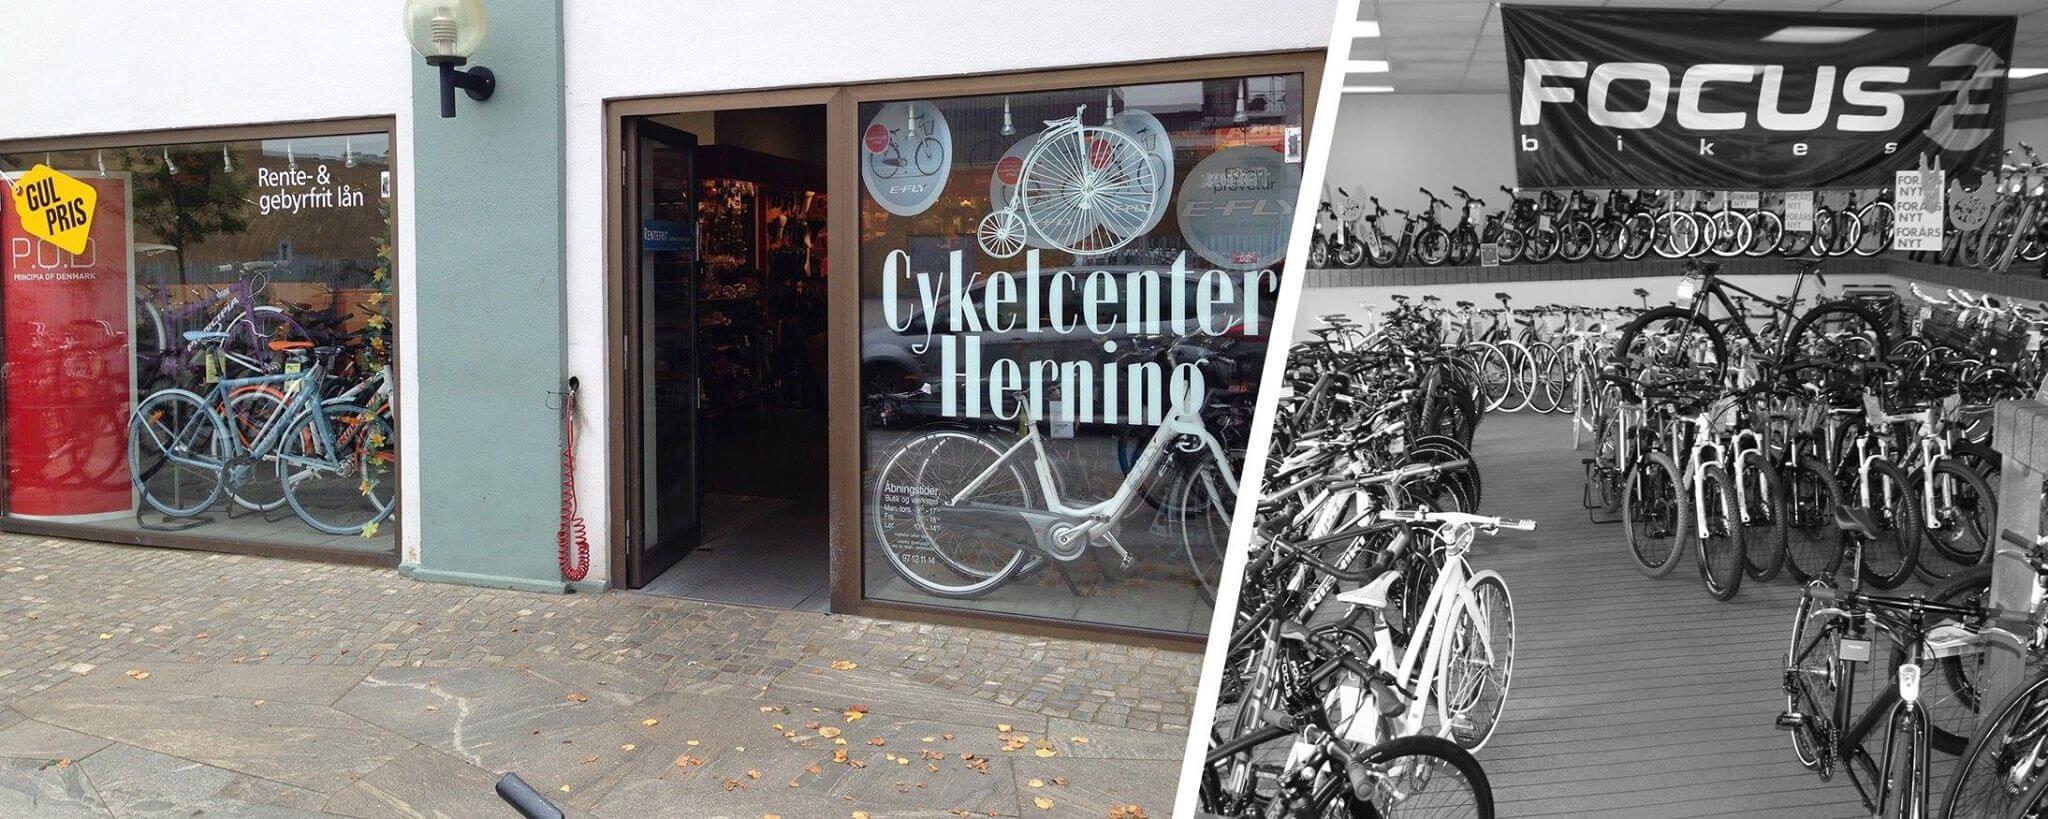 Cykelcenter Herning - Bredgade 47 - 7400